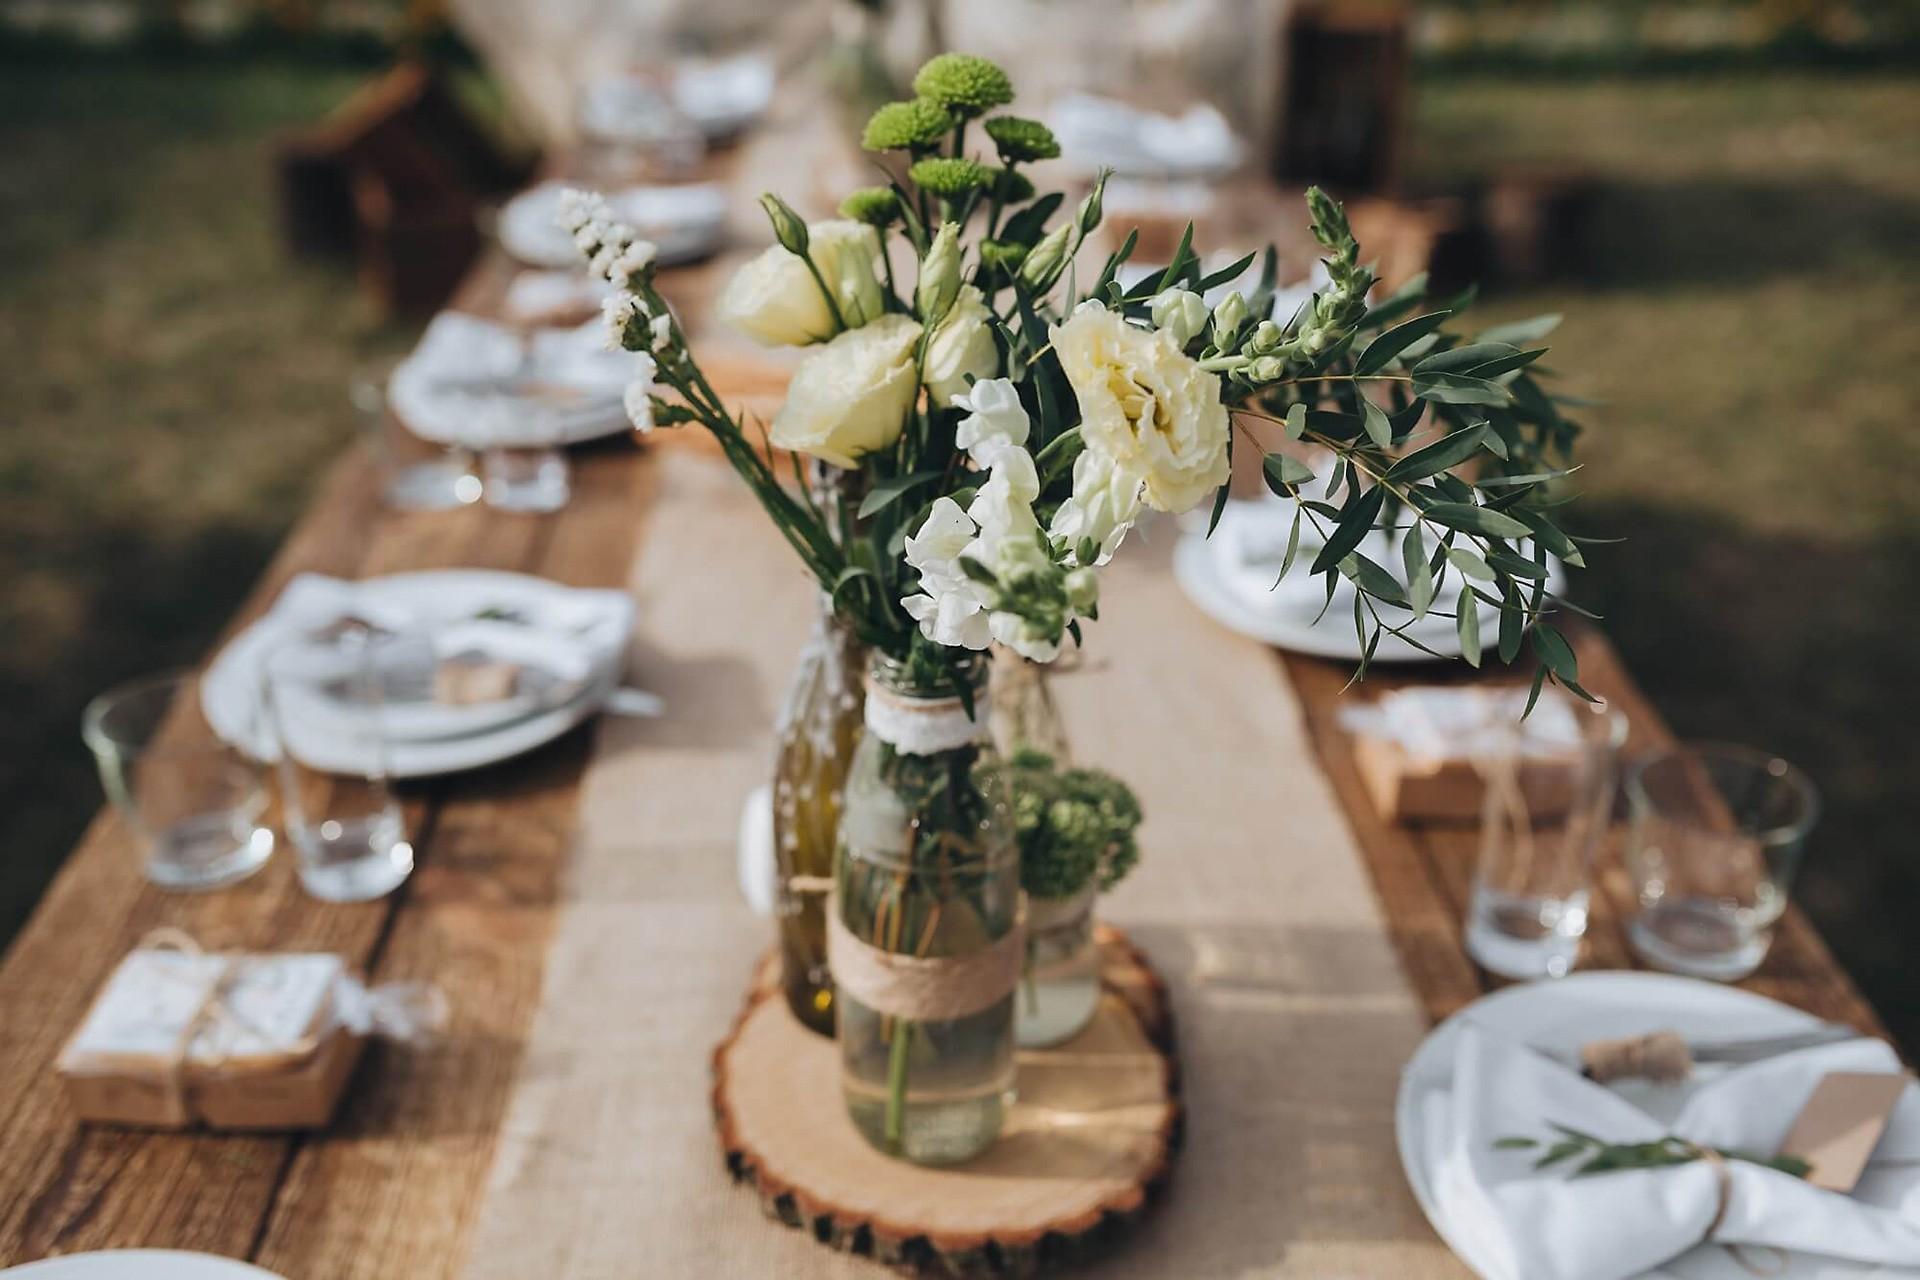 Organizadora de bodas en castilla-la mancha - 27 bodas decoración